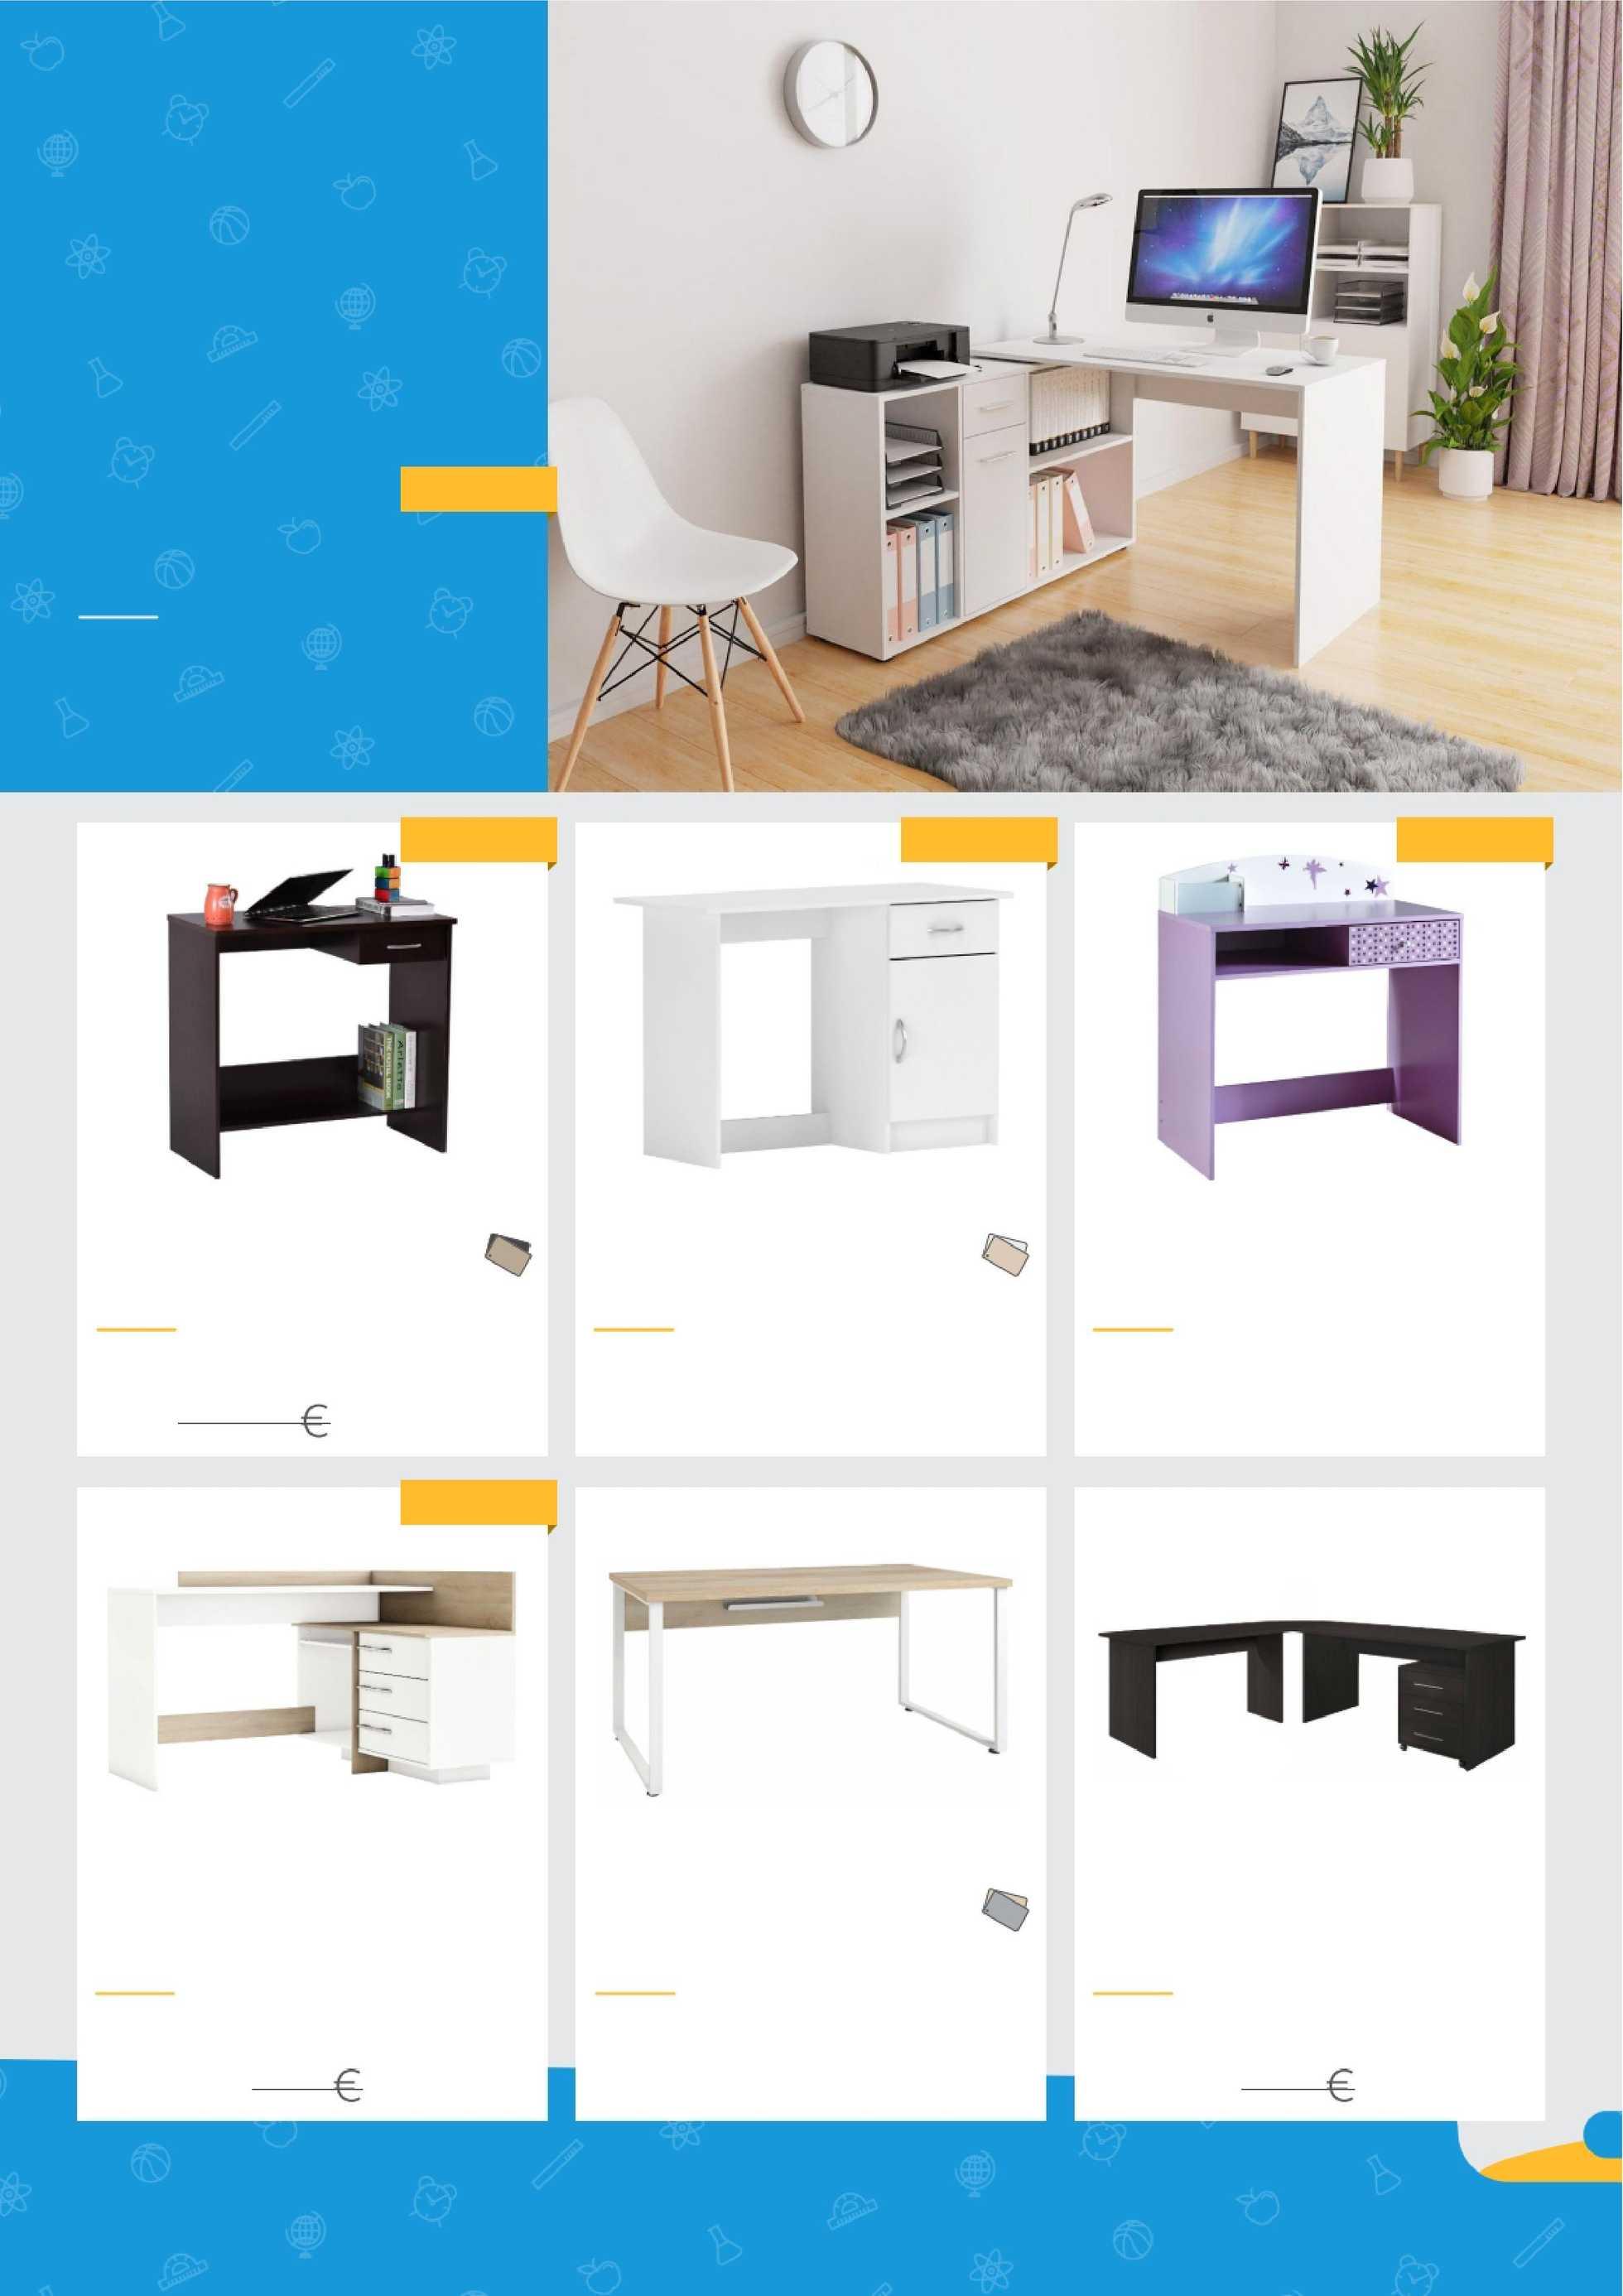 Poli Home - η προσφορά ισχύει από 01.09.2020 μέχρι 30.09.2020 - σελίδα 2.